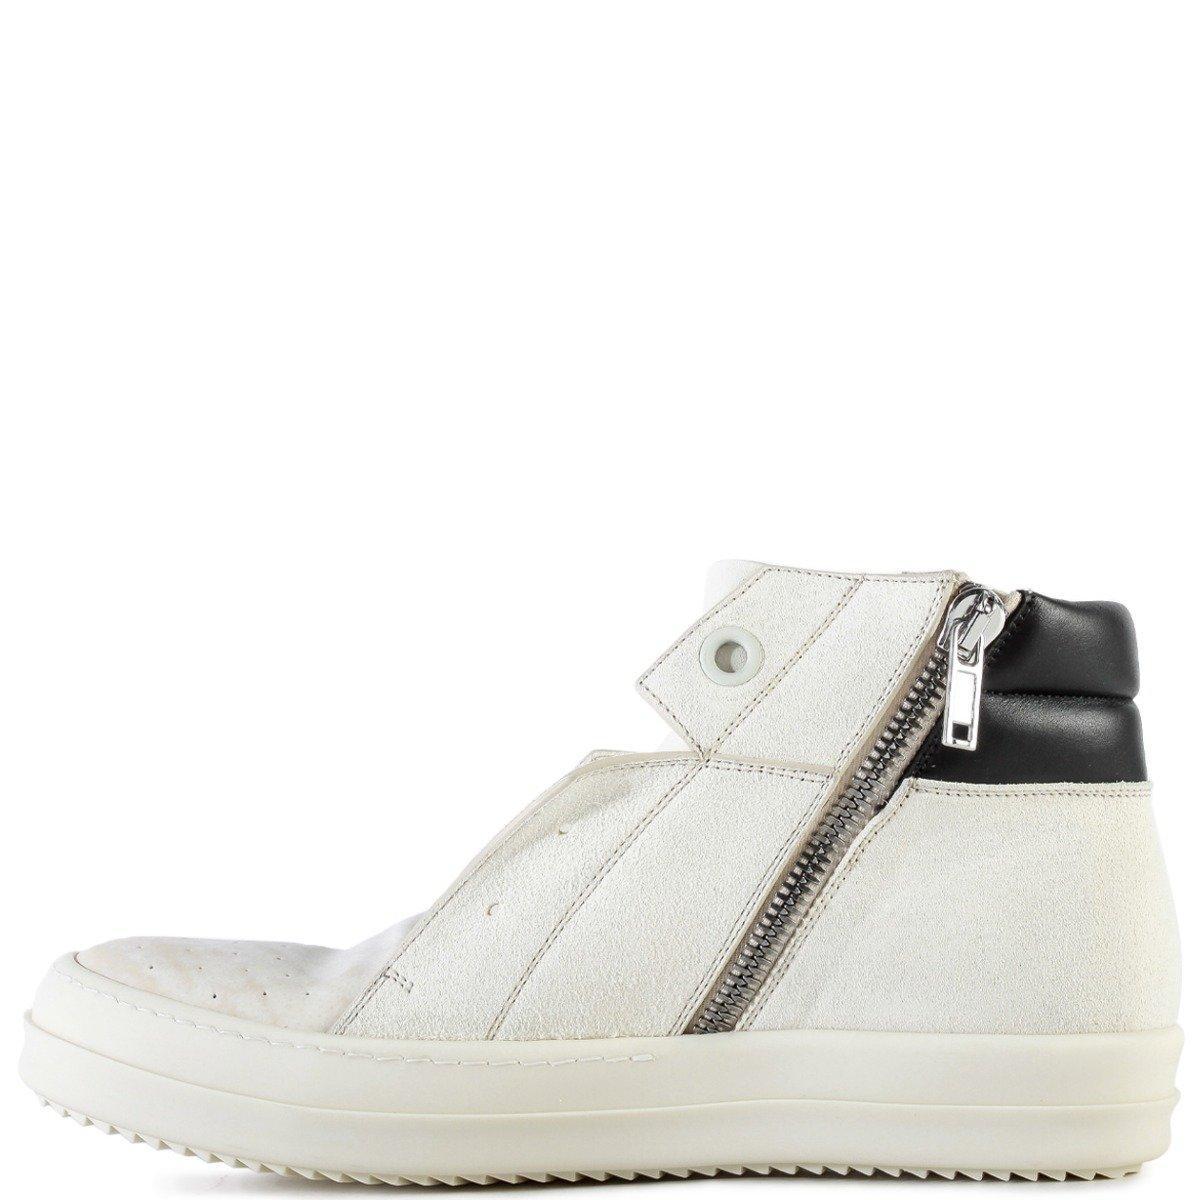 Dunk Island Australia: Rick Owens Leather Island Dunk Sneakers Milk/black